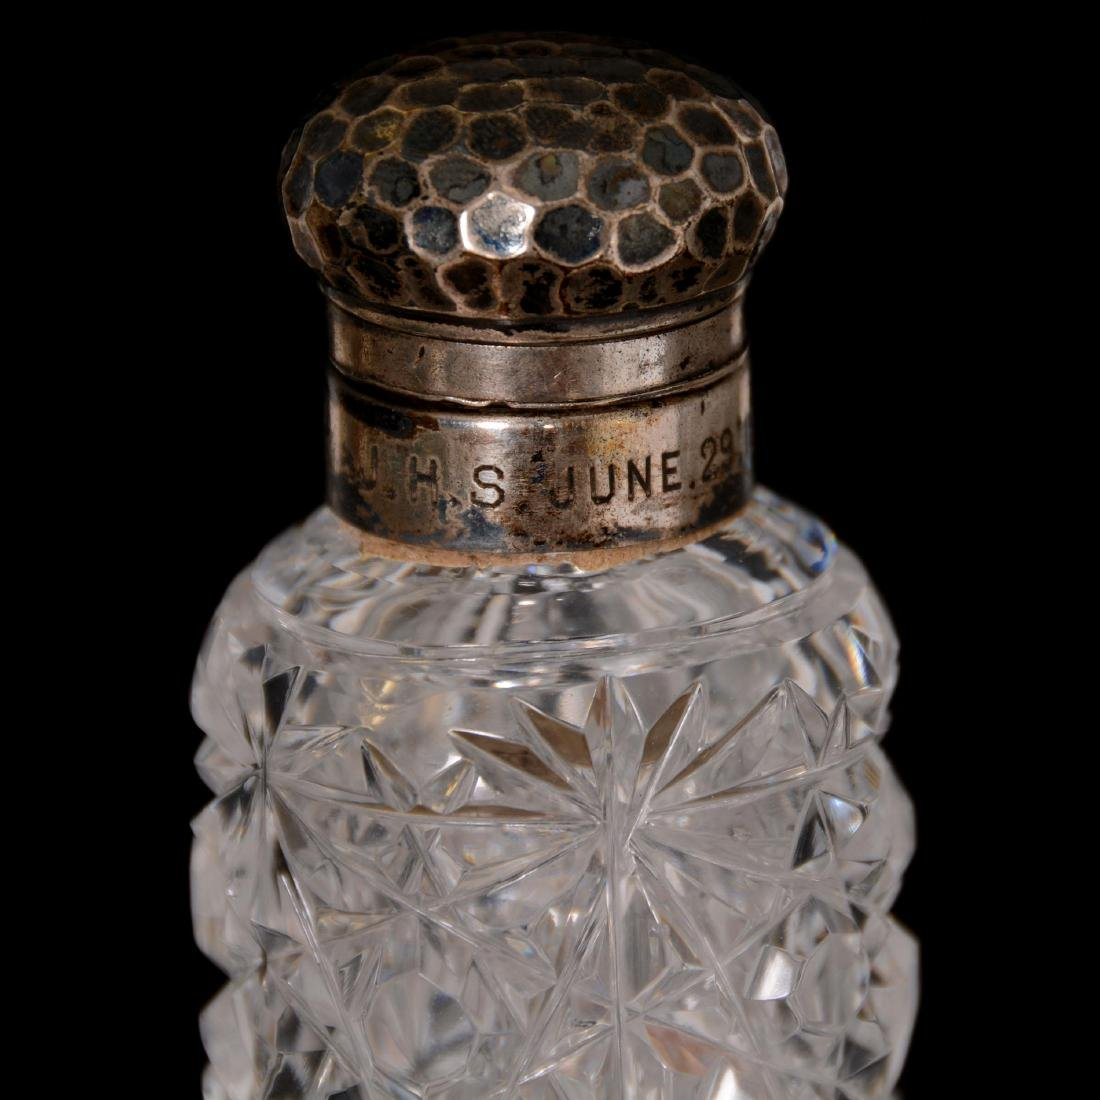 Laydown Perfume Bottle - ABCG - 2